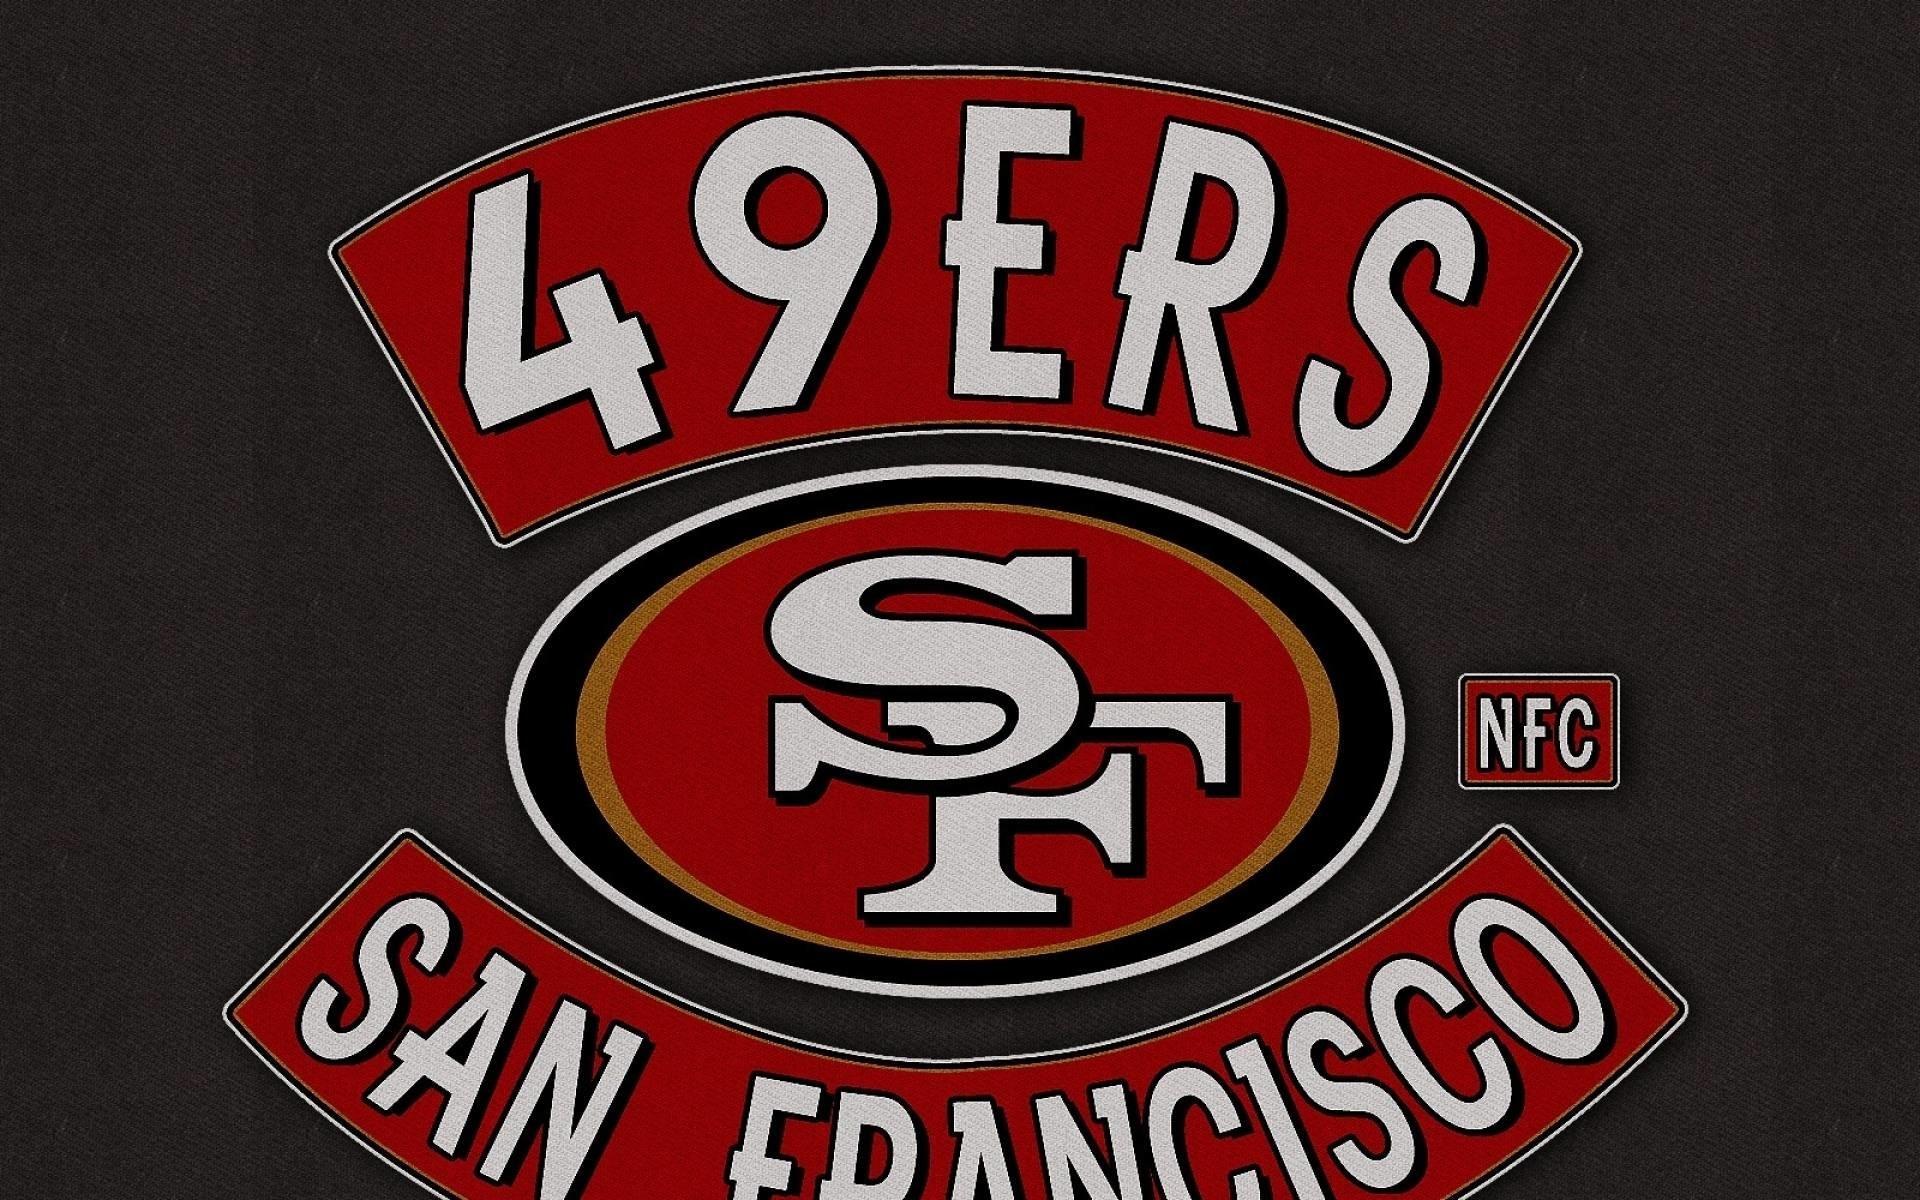 1920x1080 San Francisco 49ers wallpaper | San Francisco 49ers wallpapers